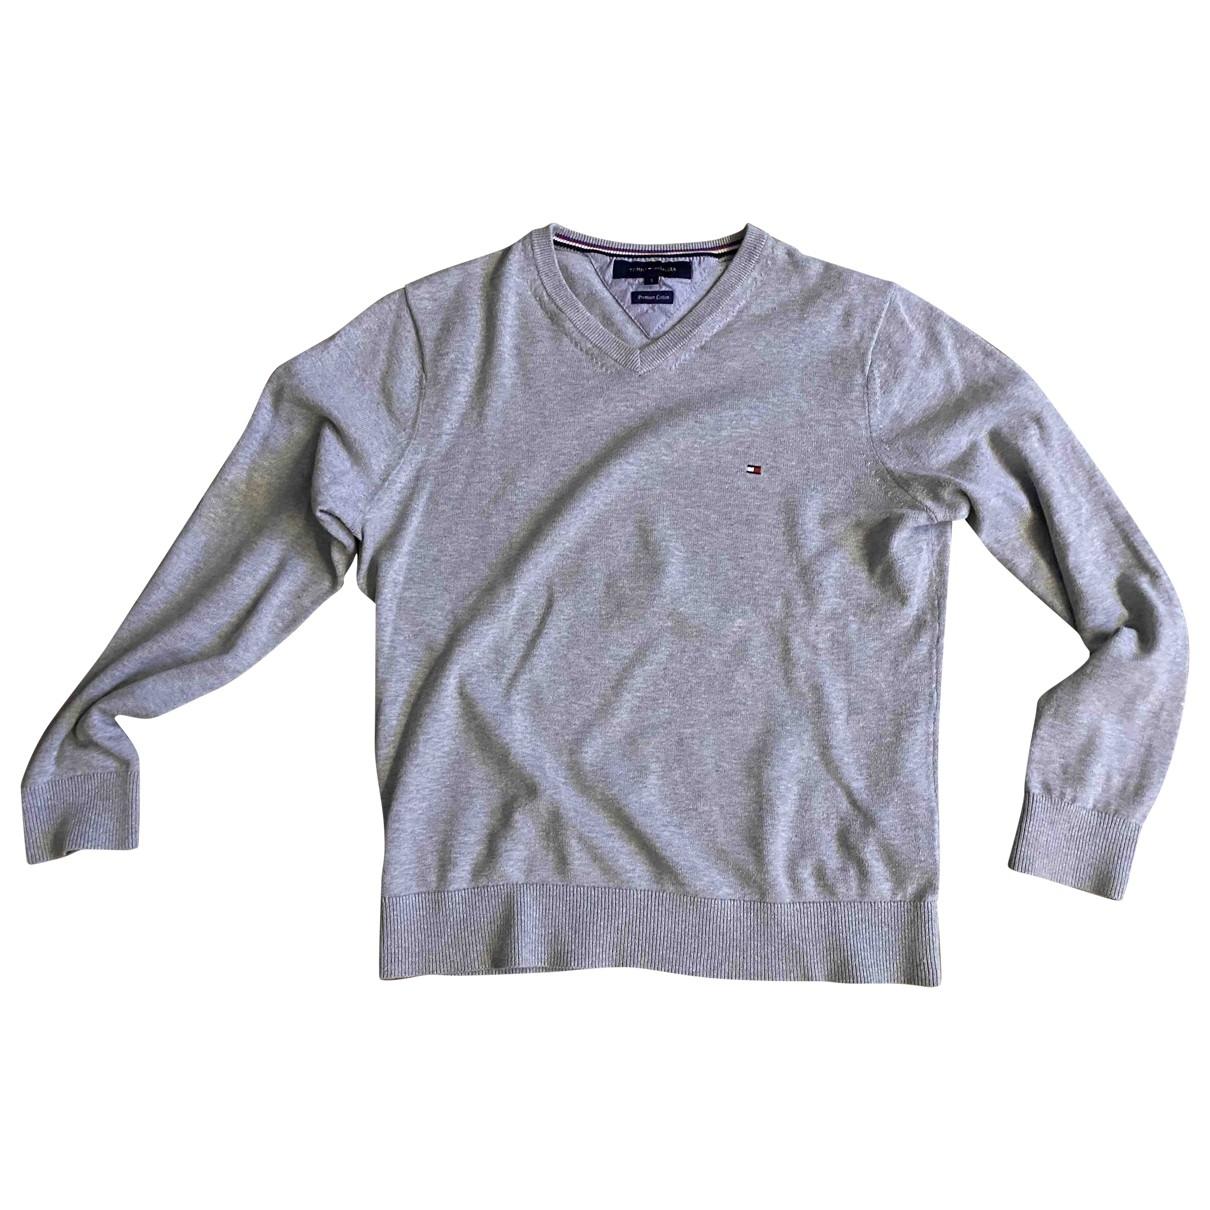 Tommy Hilfiger \N Grey Cotton Knitwear & Sweatshirts for Men S International